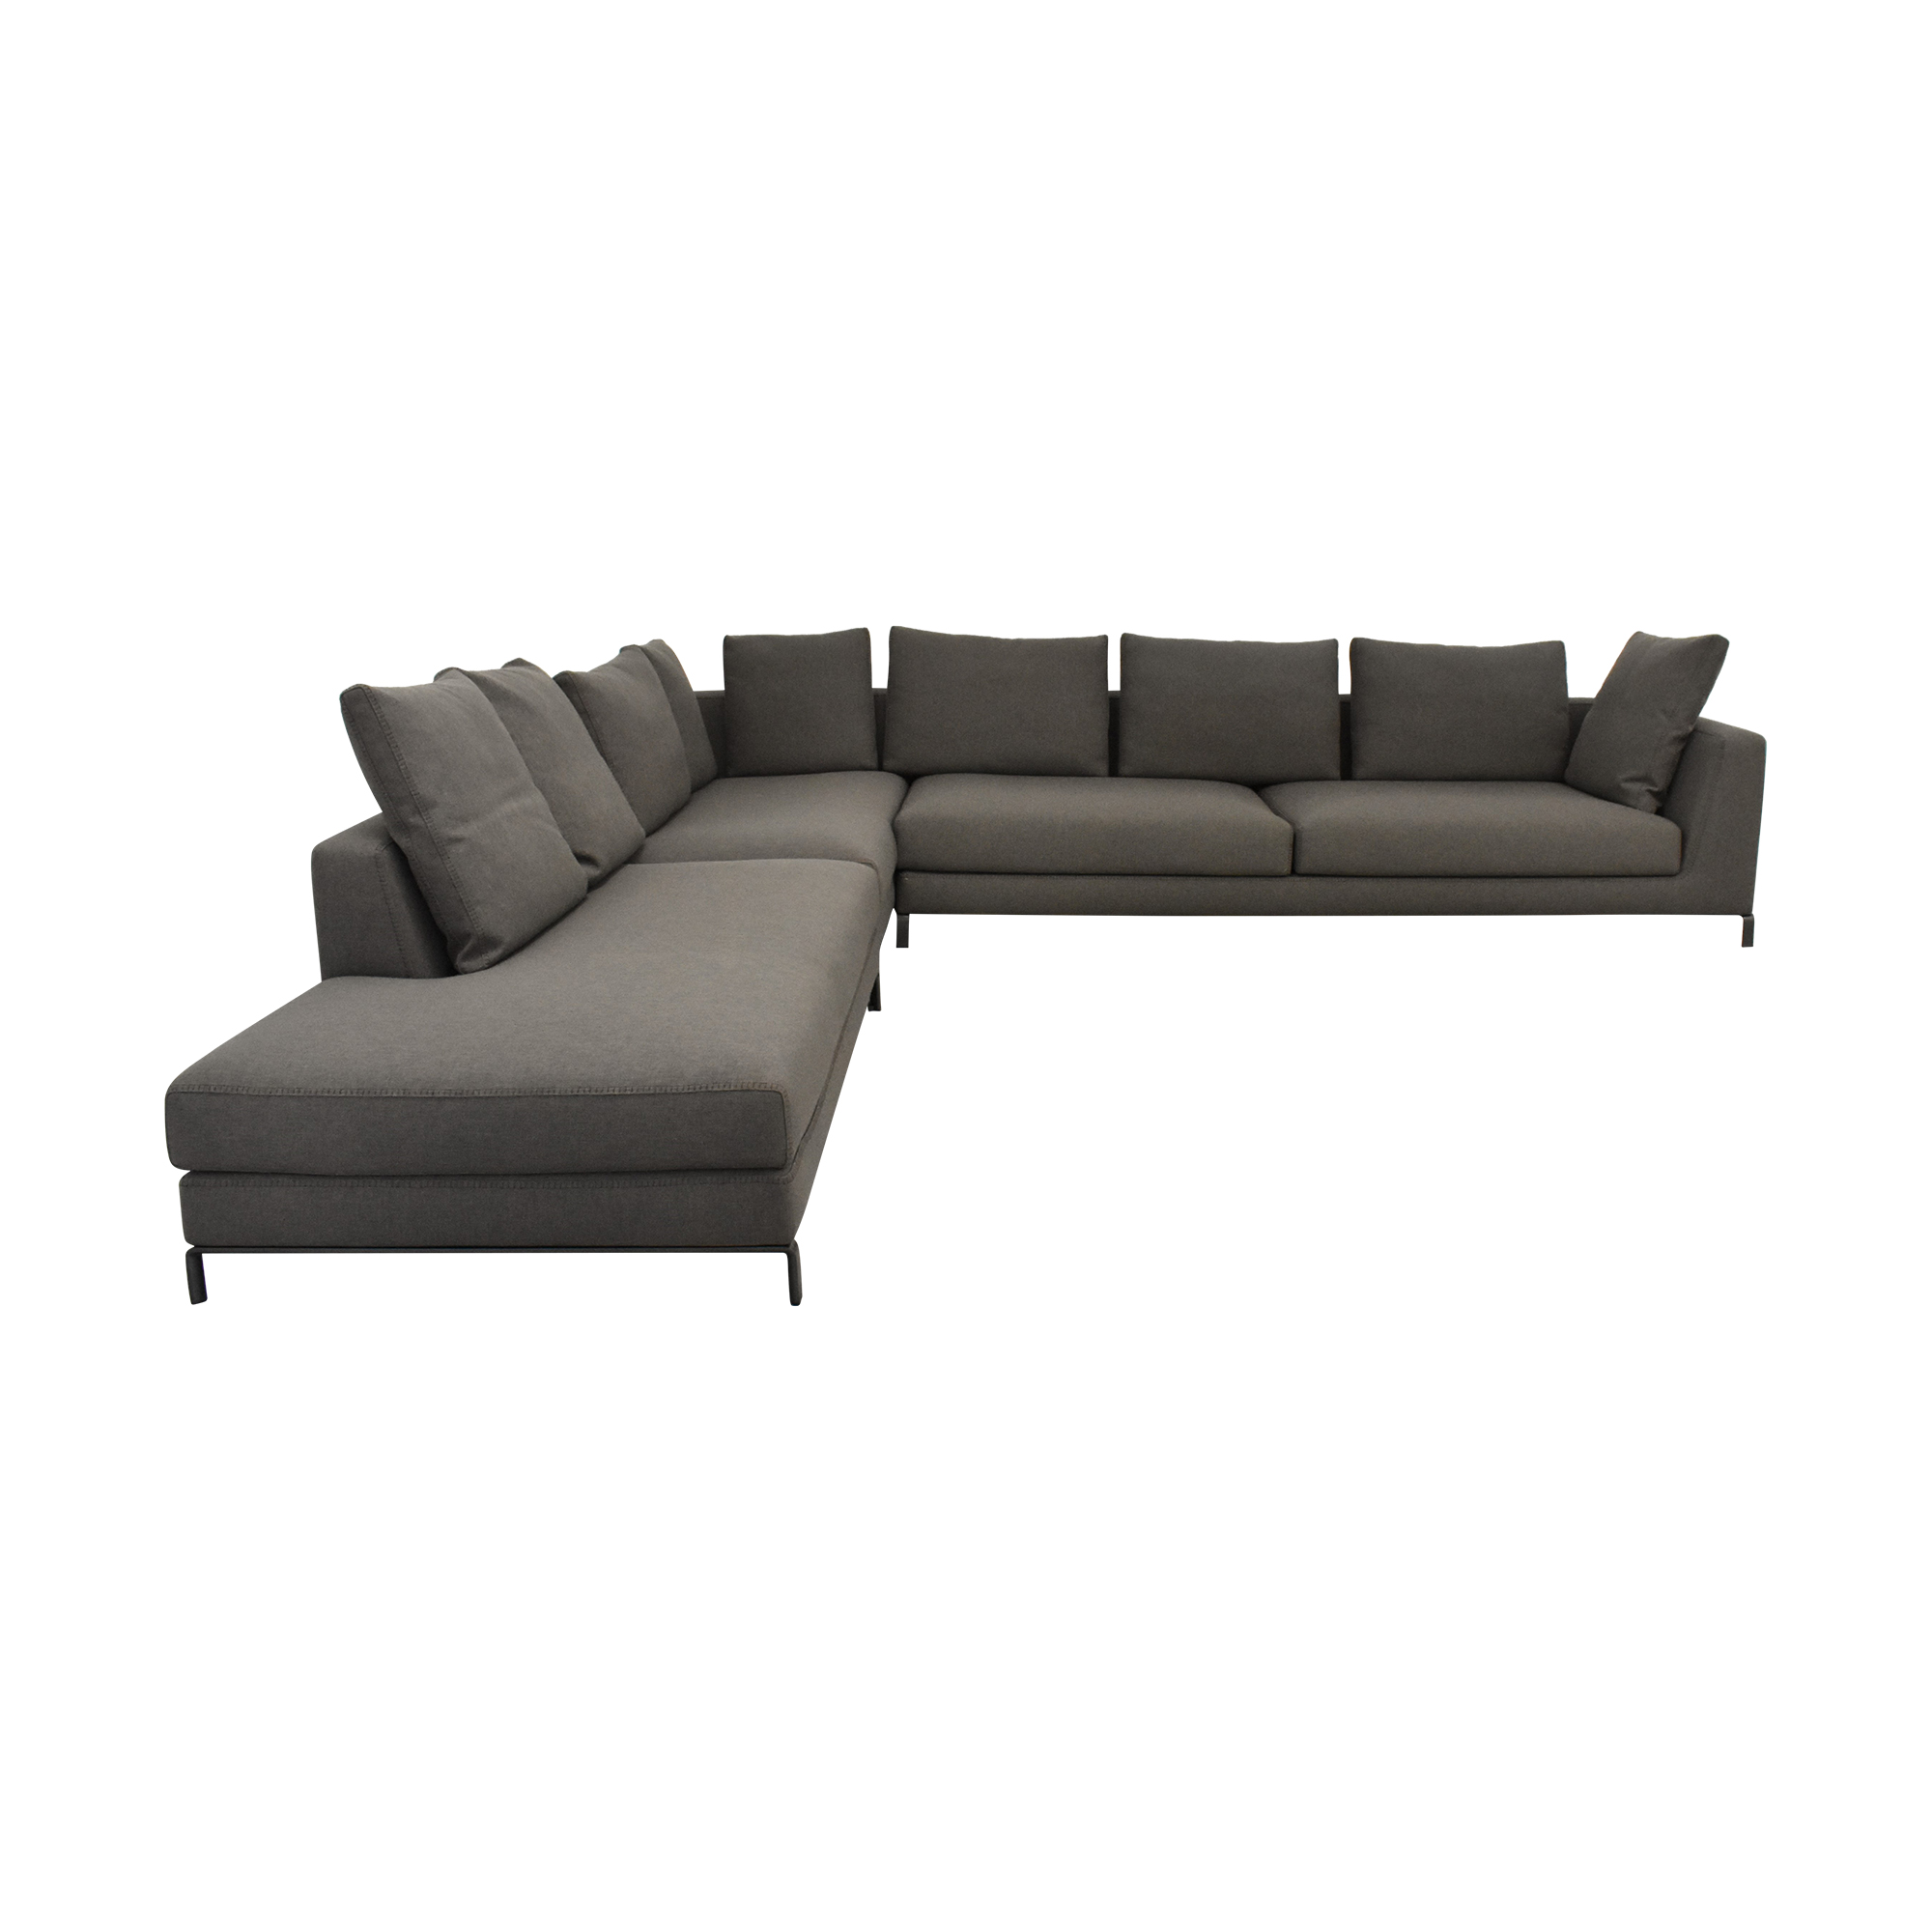 B&B Italia Modern Sectional Sofa sale